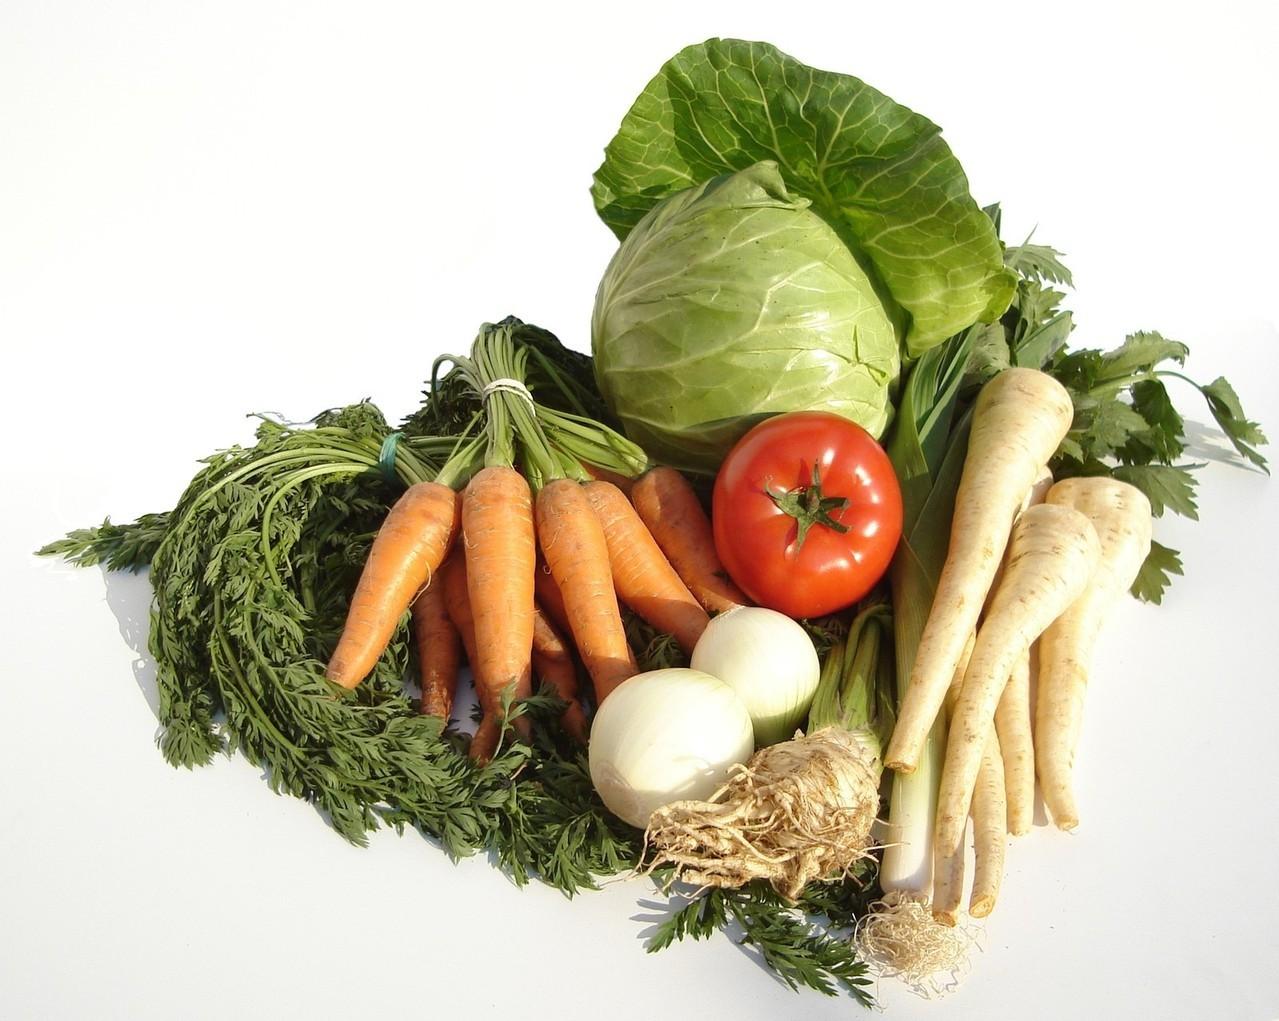 Promuj wegetarianizm. Koszulki i Internet